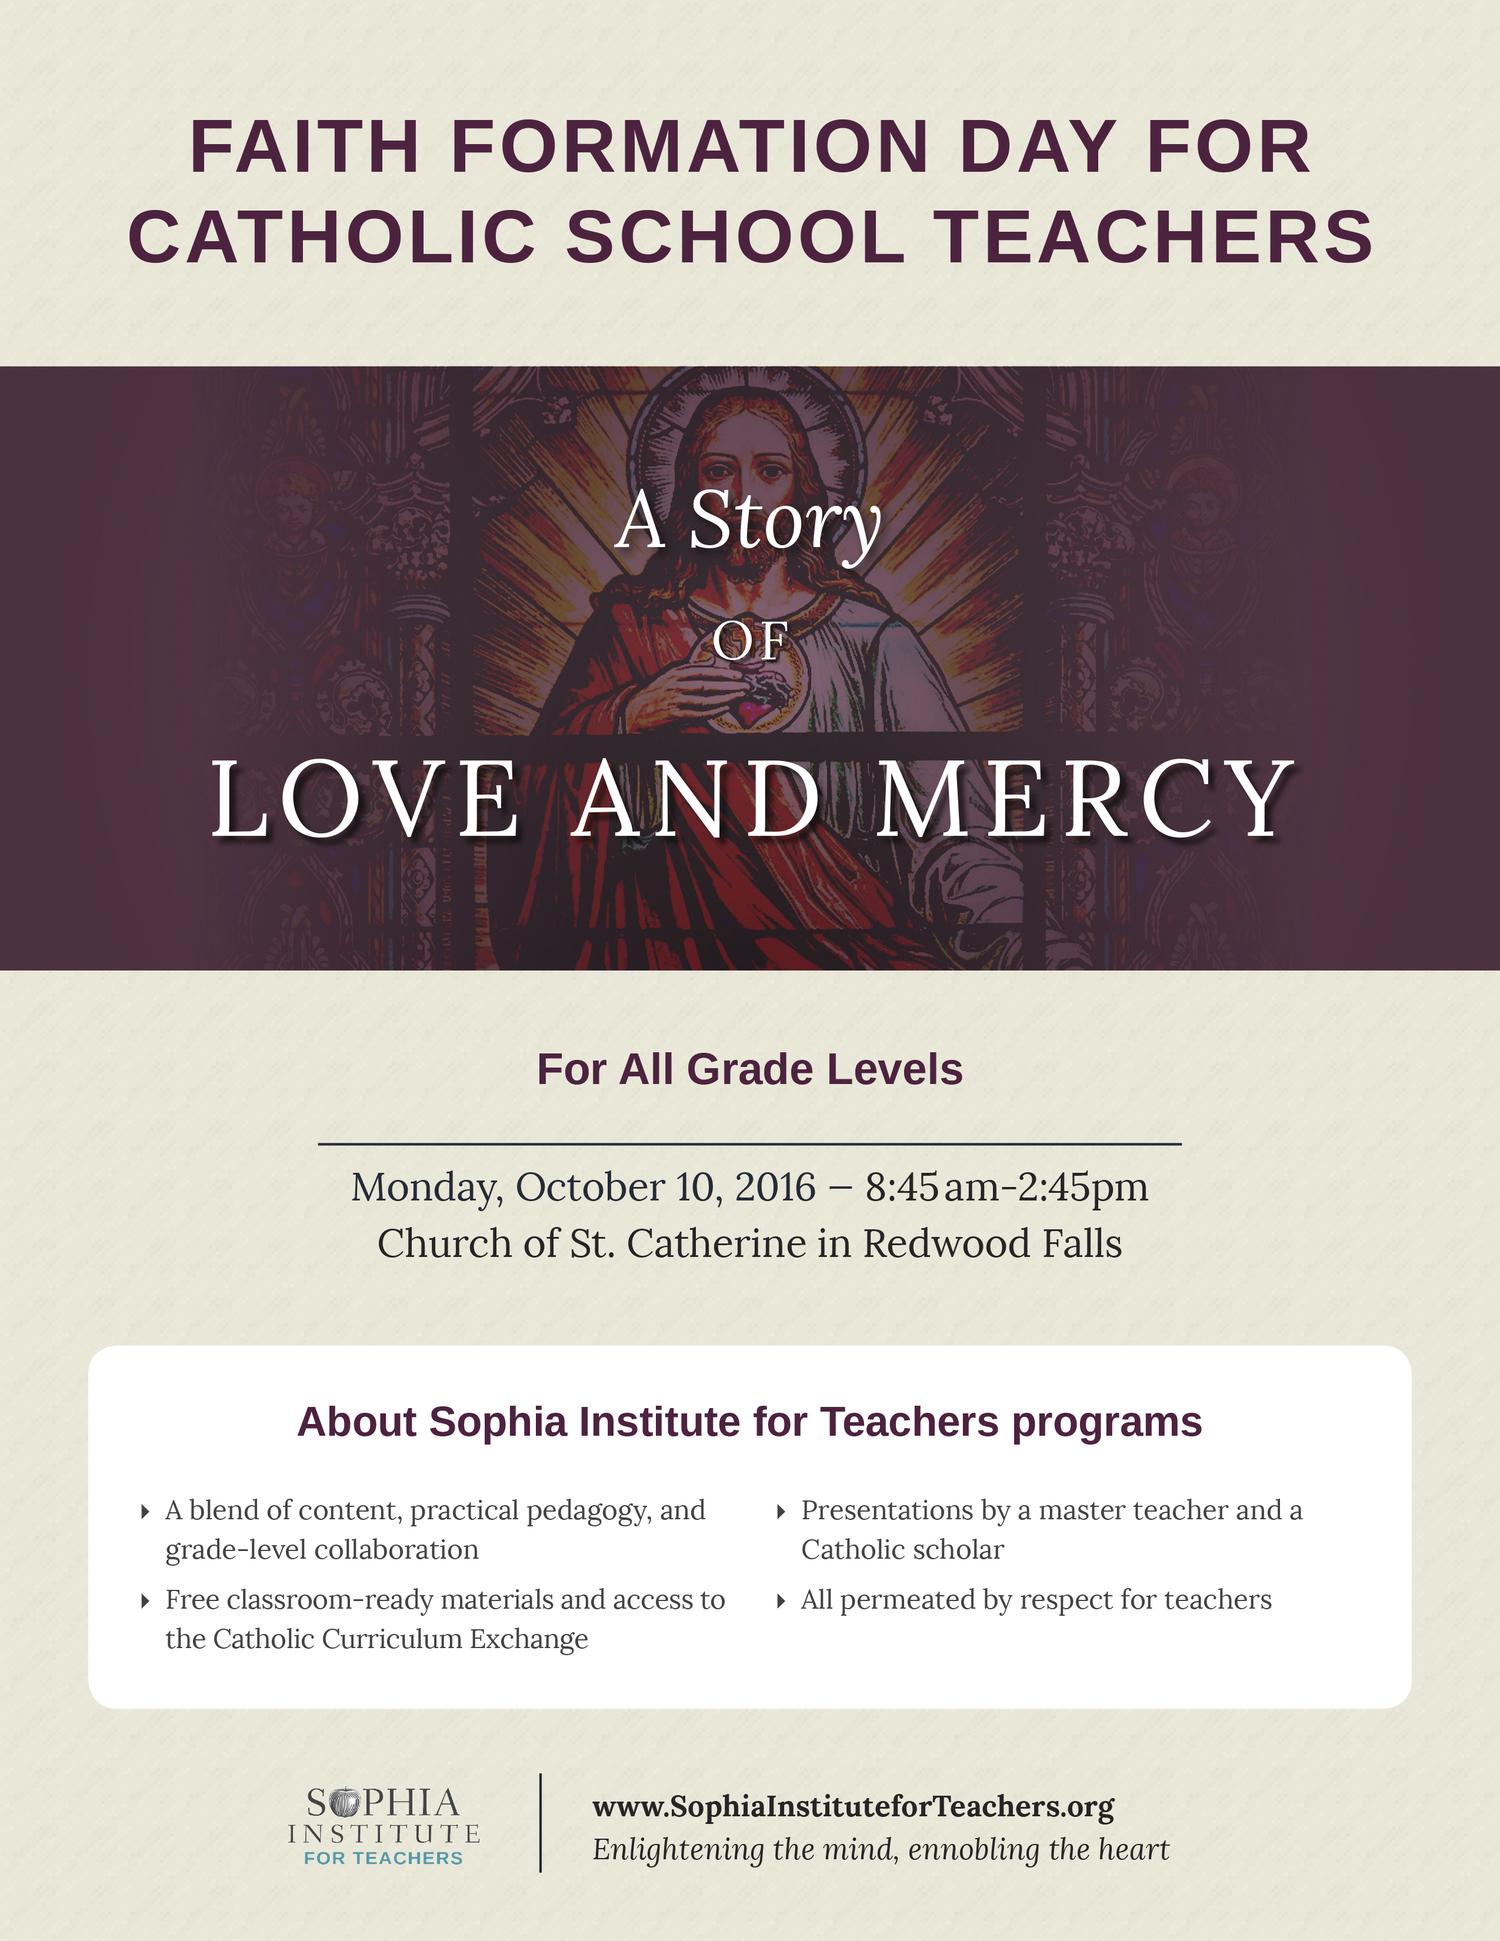 Faith Formation Day for Catholic School Teachers — Diocese of New Ulm